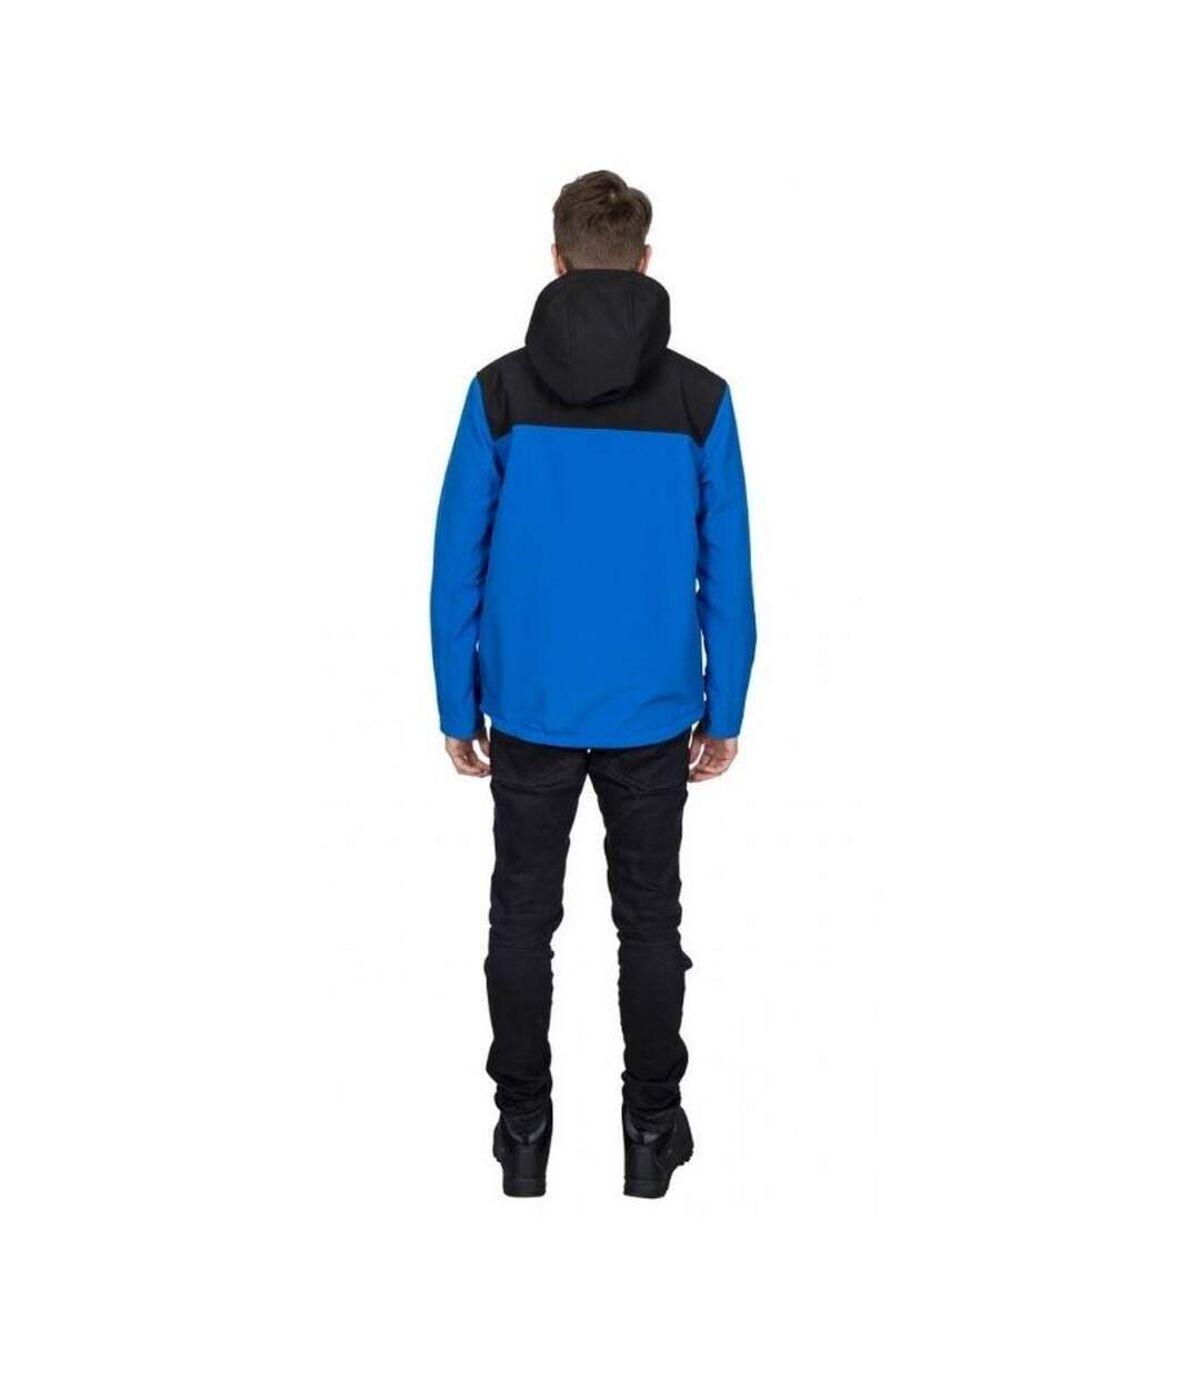 Trespass - Veste HEBRON - Homme (Bleu) - UTTP4587